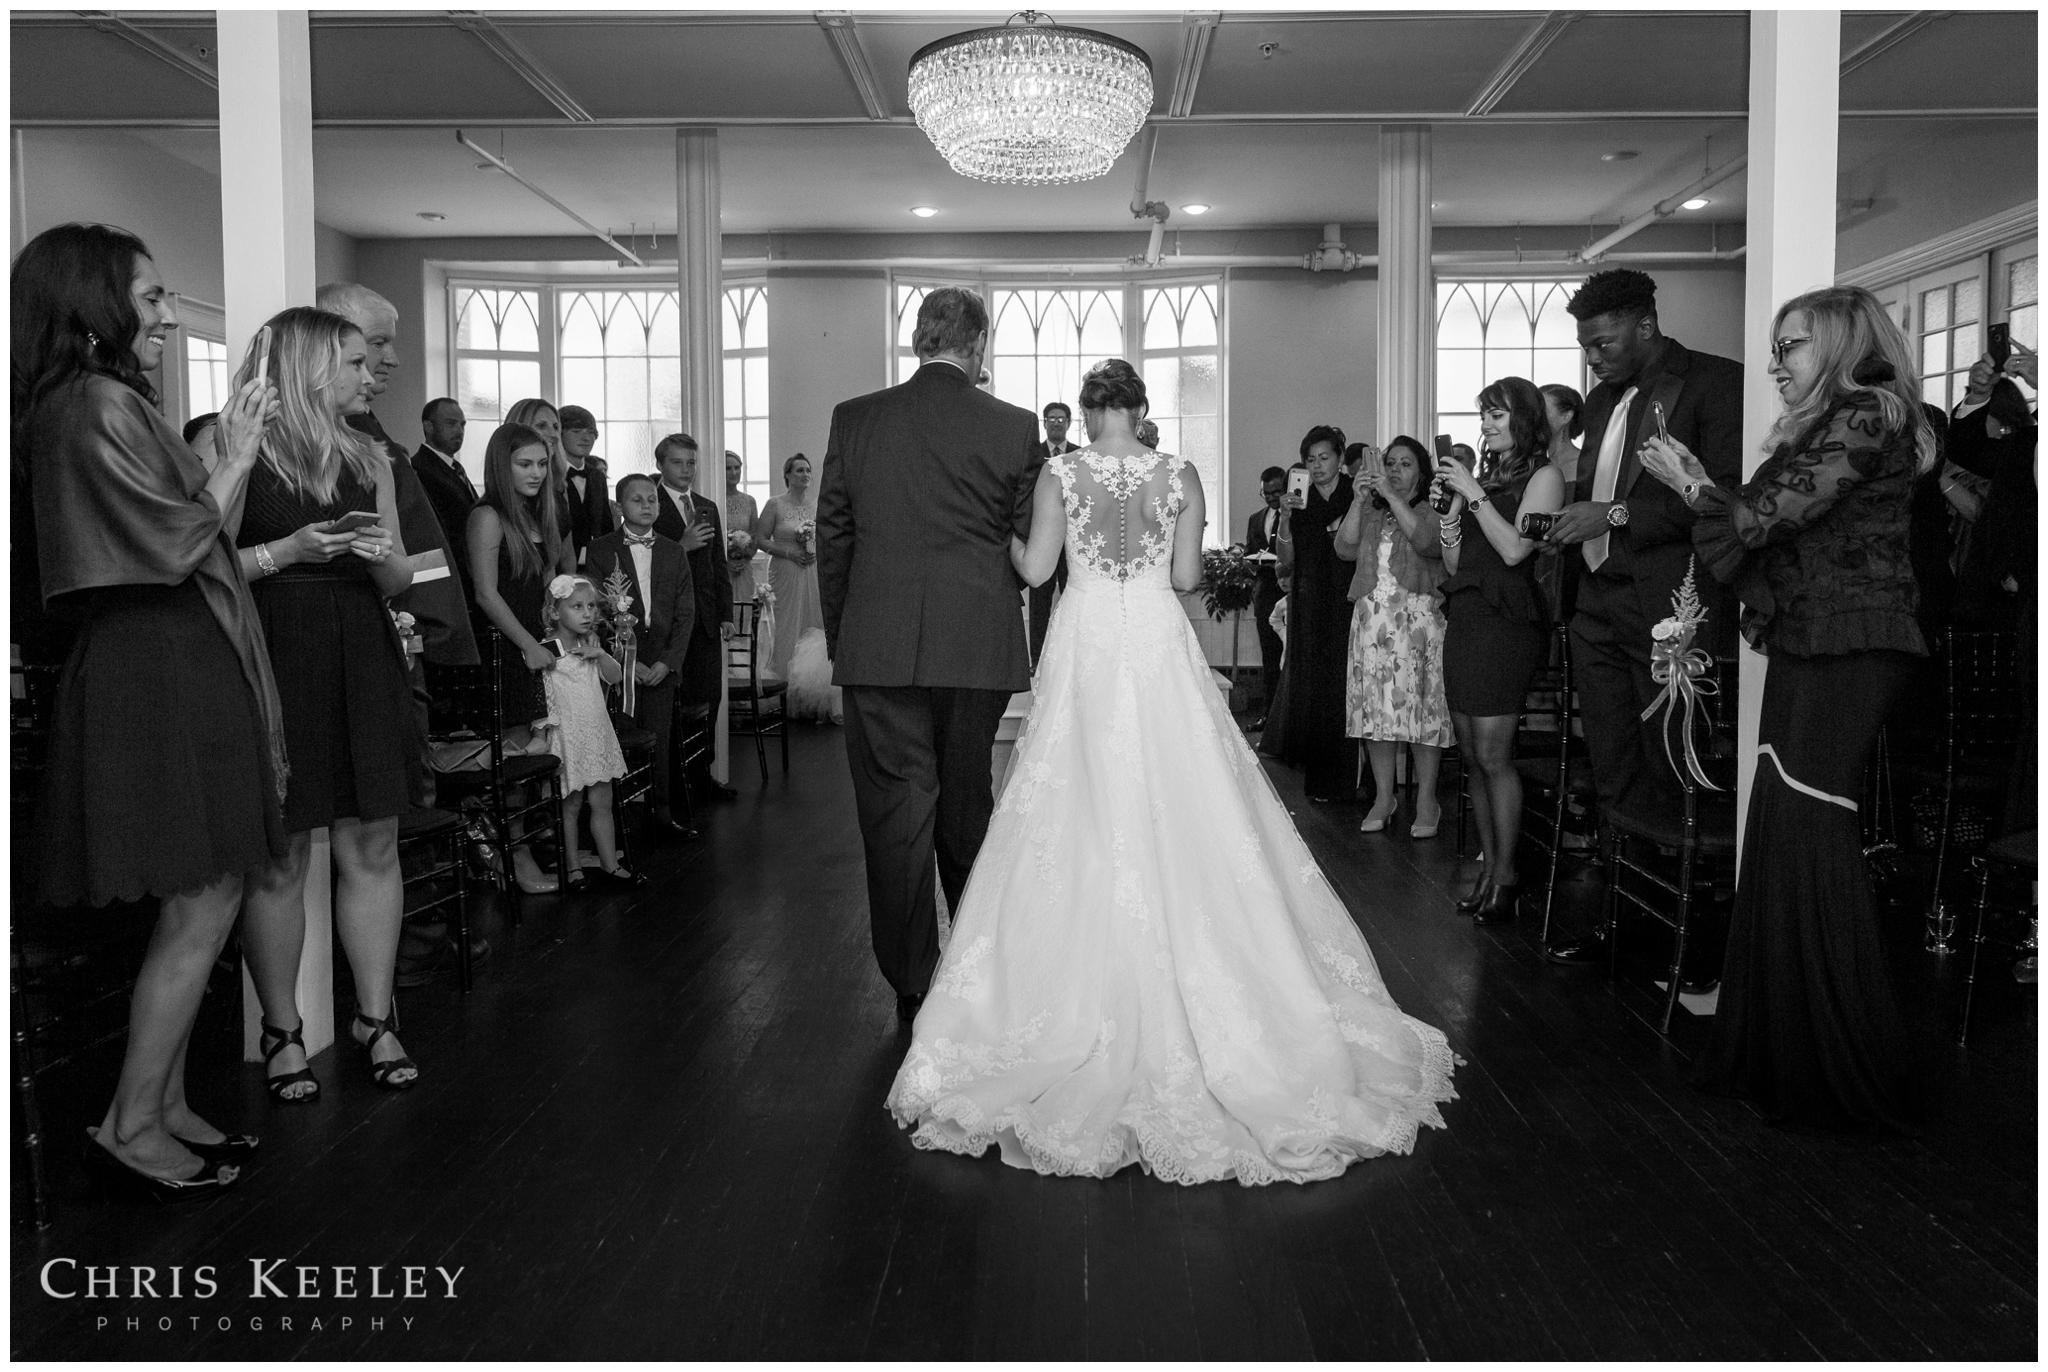 grace-restaurant-portland-maine-wedding-photographer-chris-keeley-38.jpg